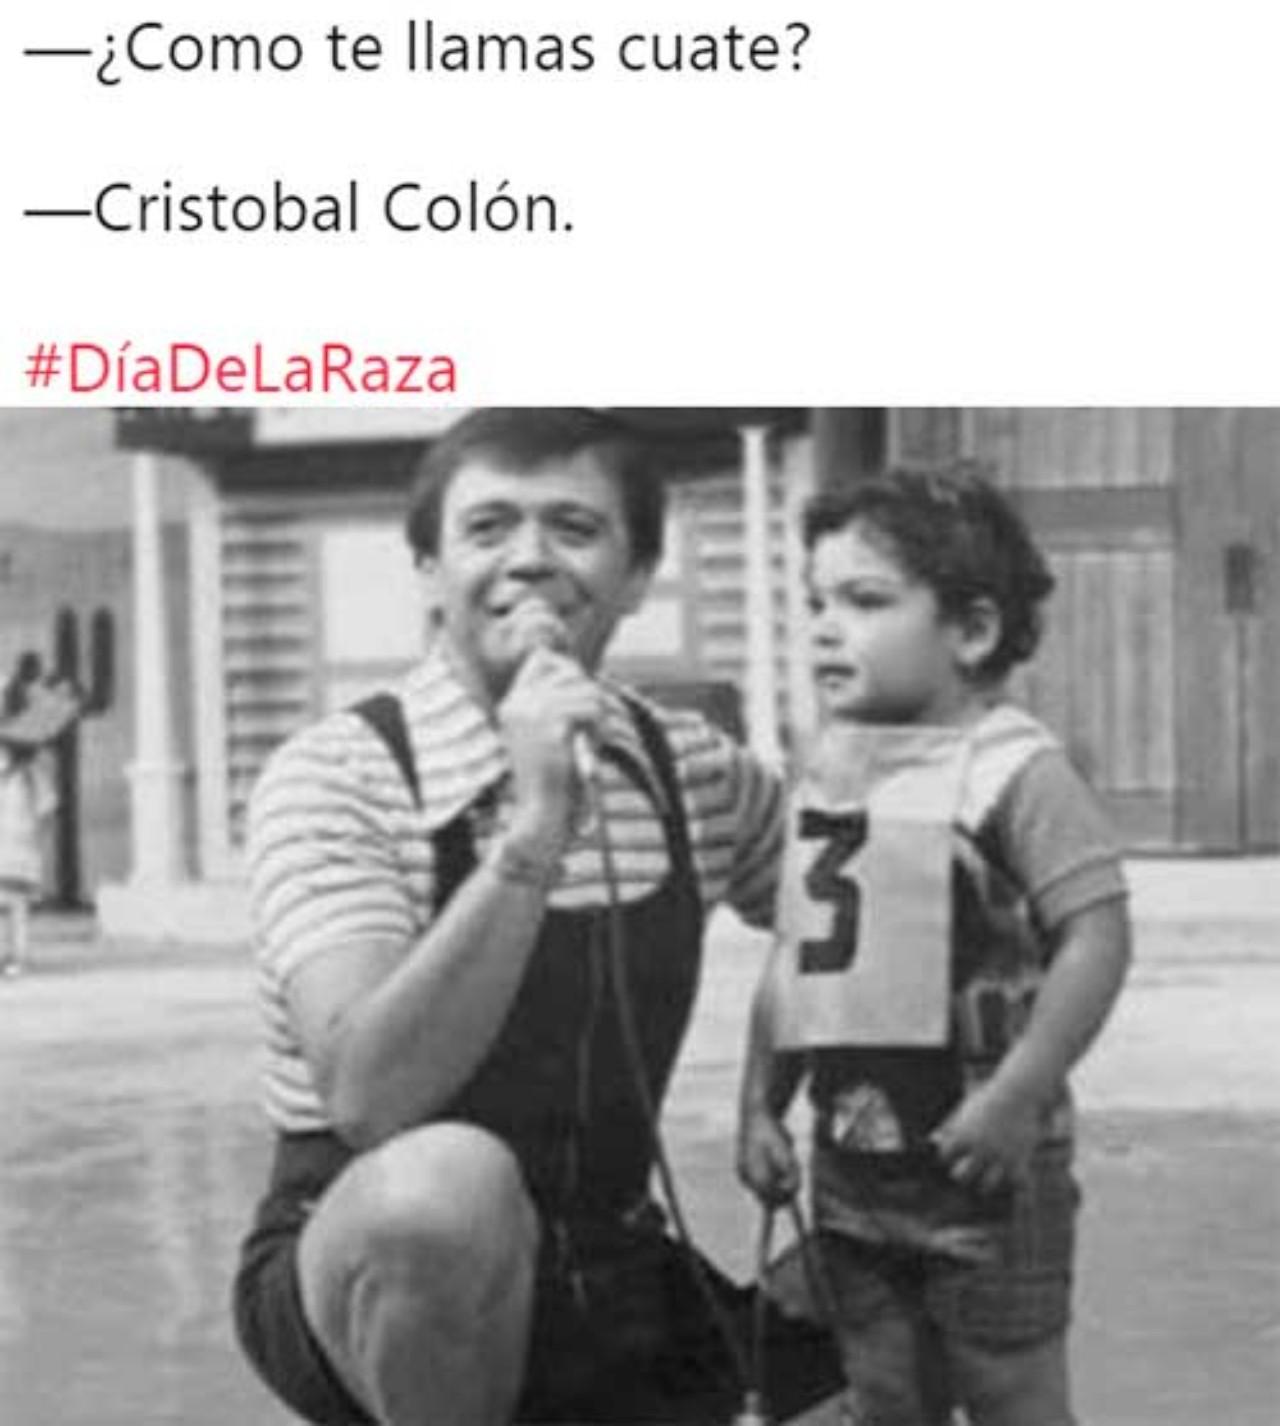 Chabelo Cristobal Colon dia de raza